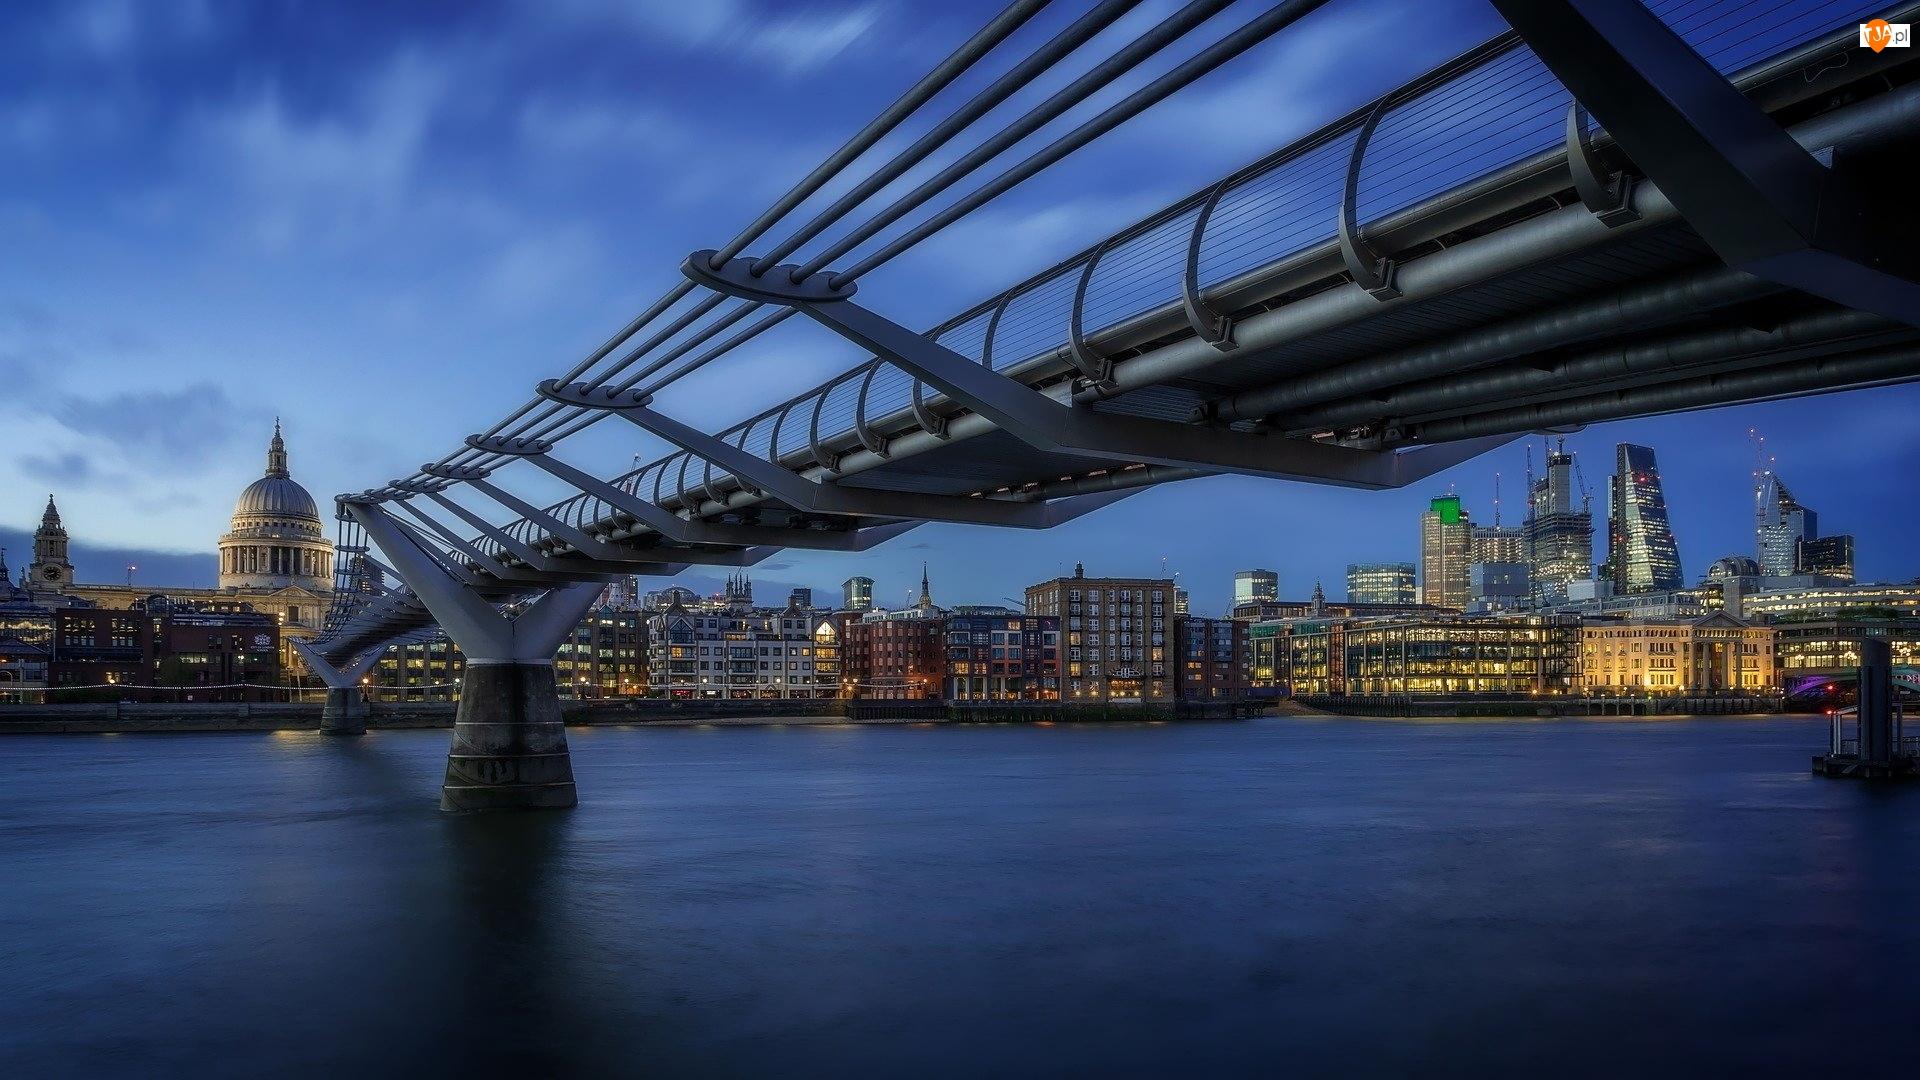 Millennium Bridge, Most, Domy, Anglia, Rzeka Tamiza, Londyn